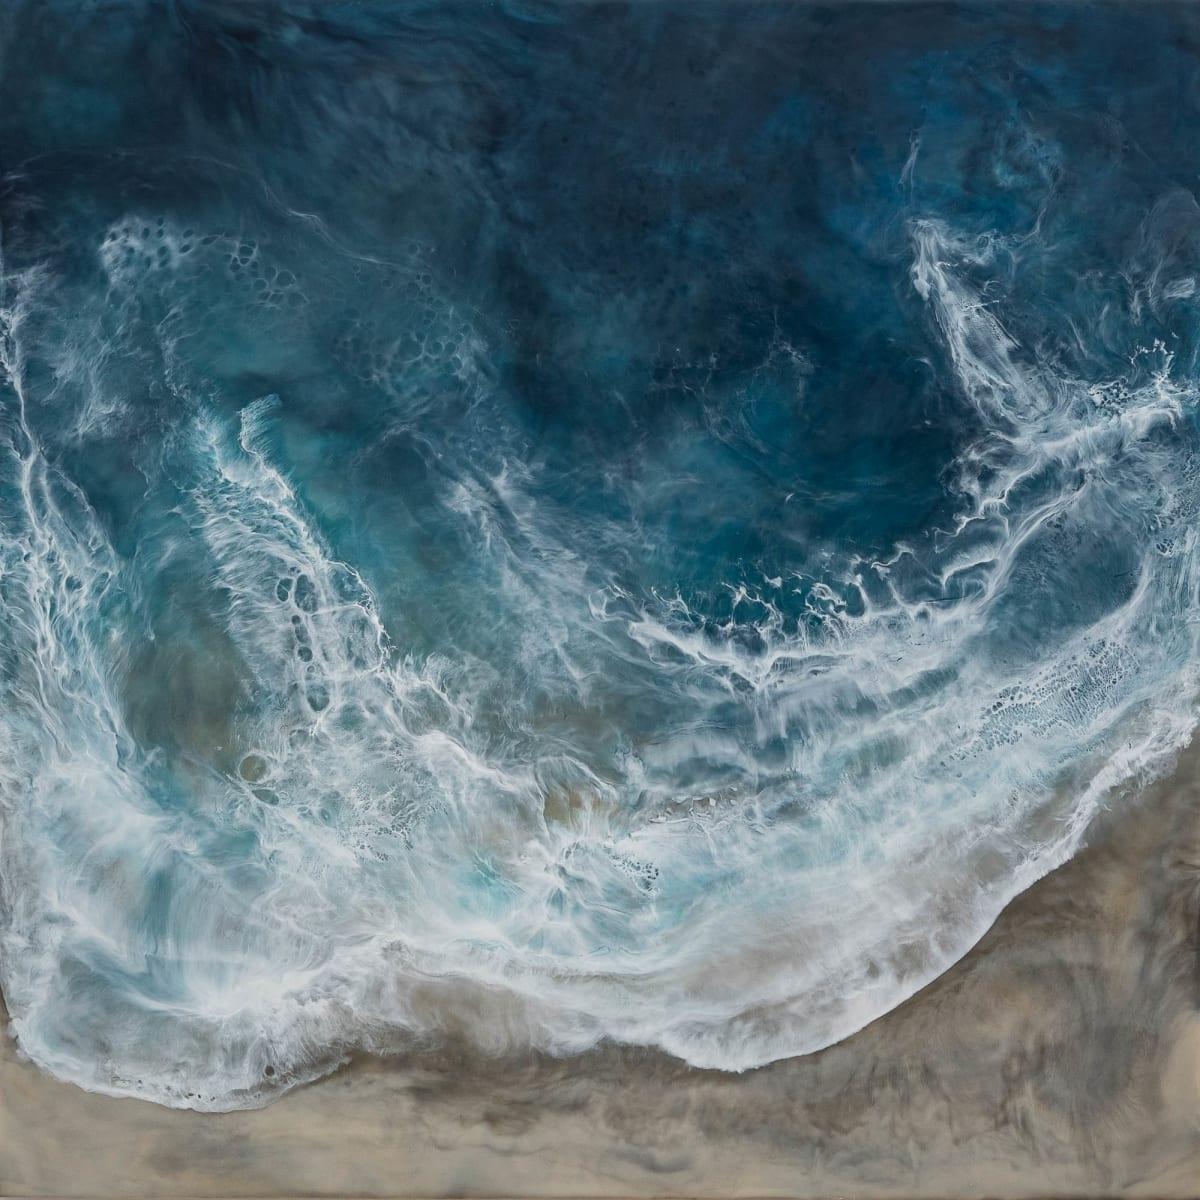 Agate Beach by Julie Brookman